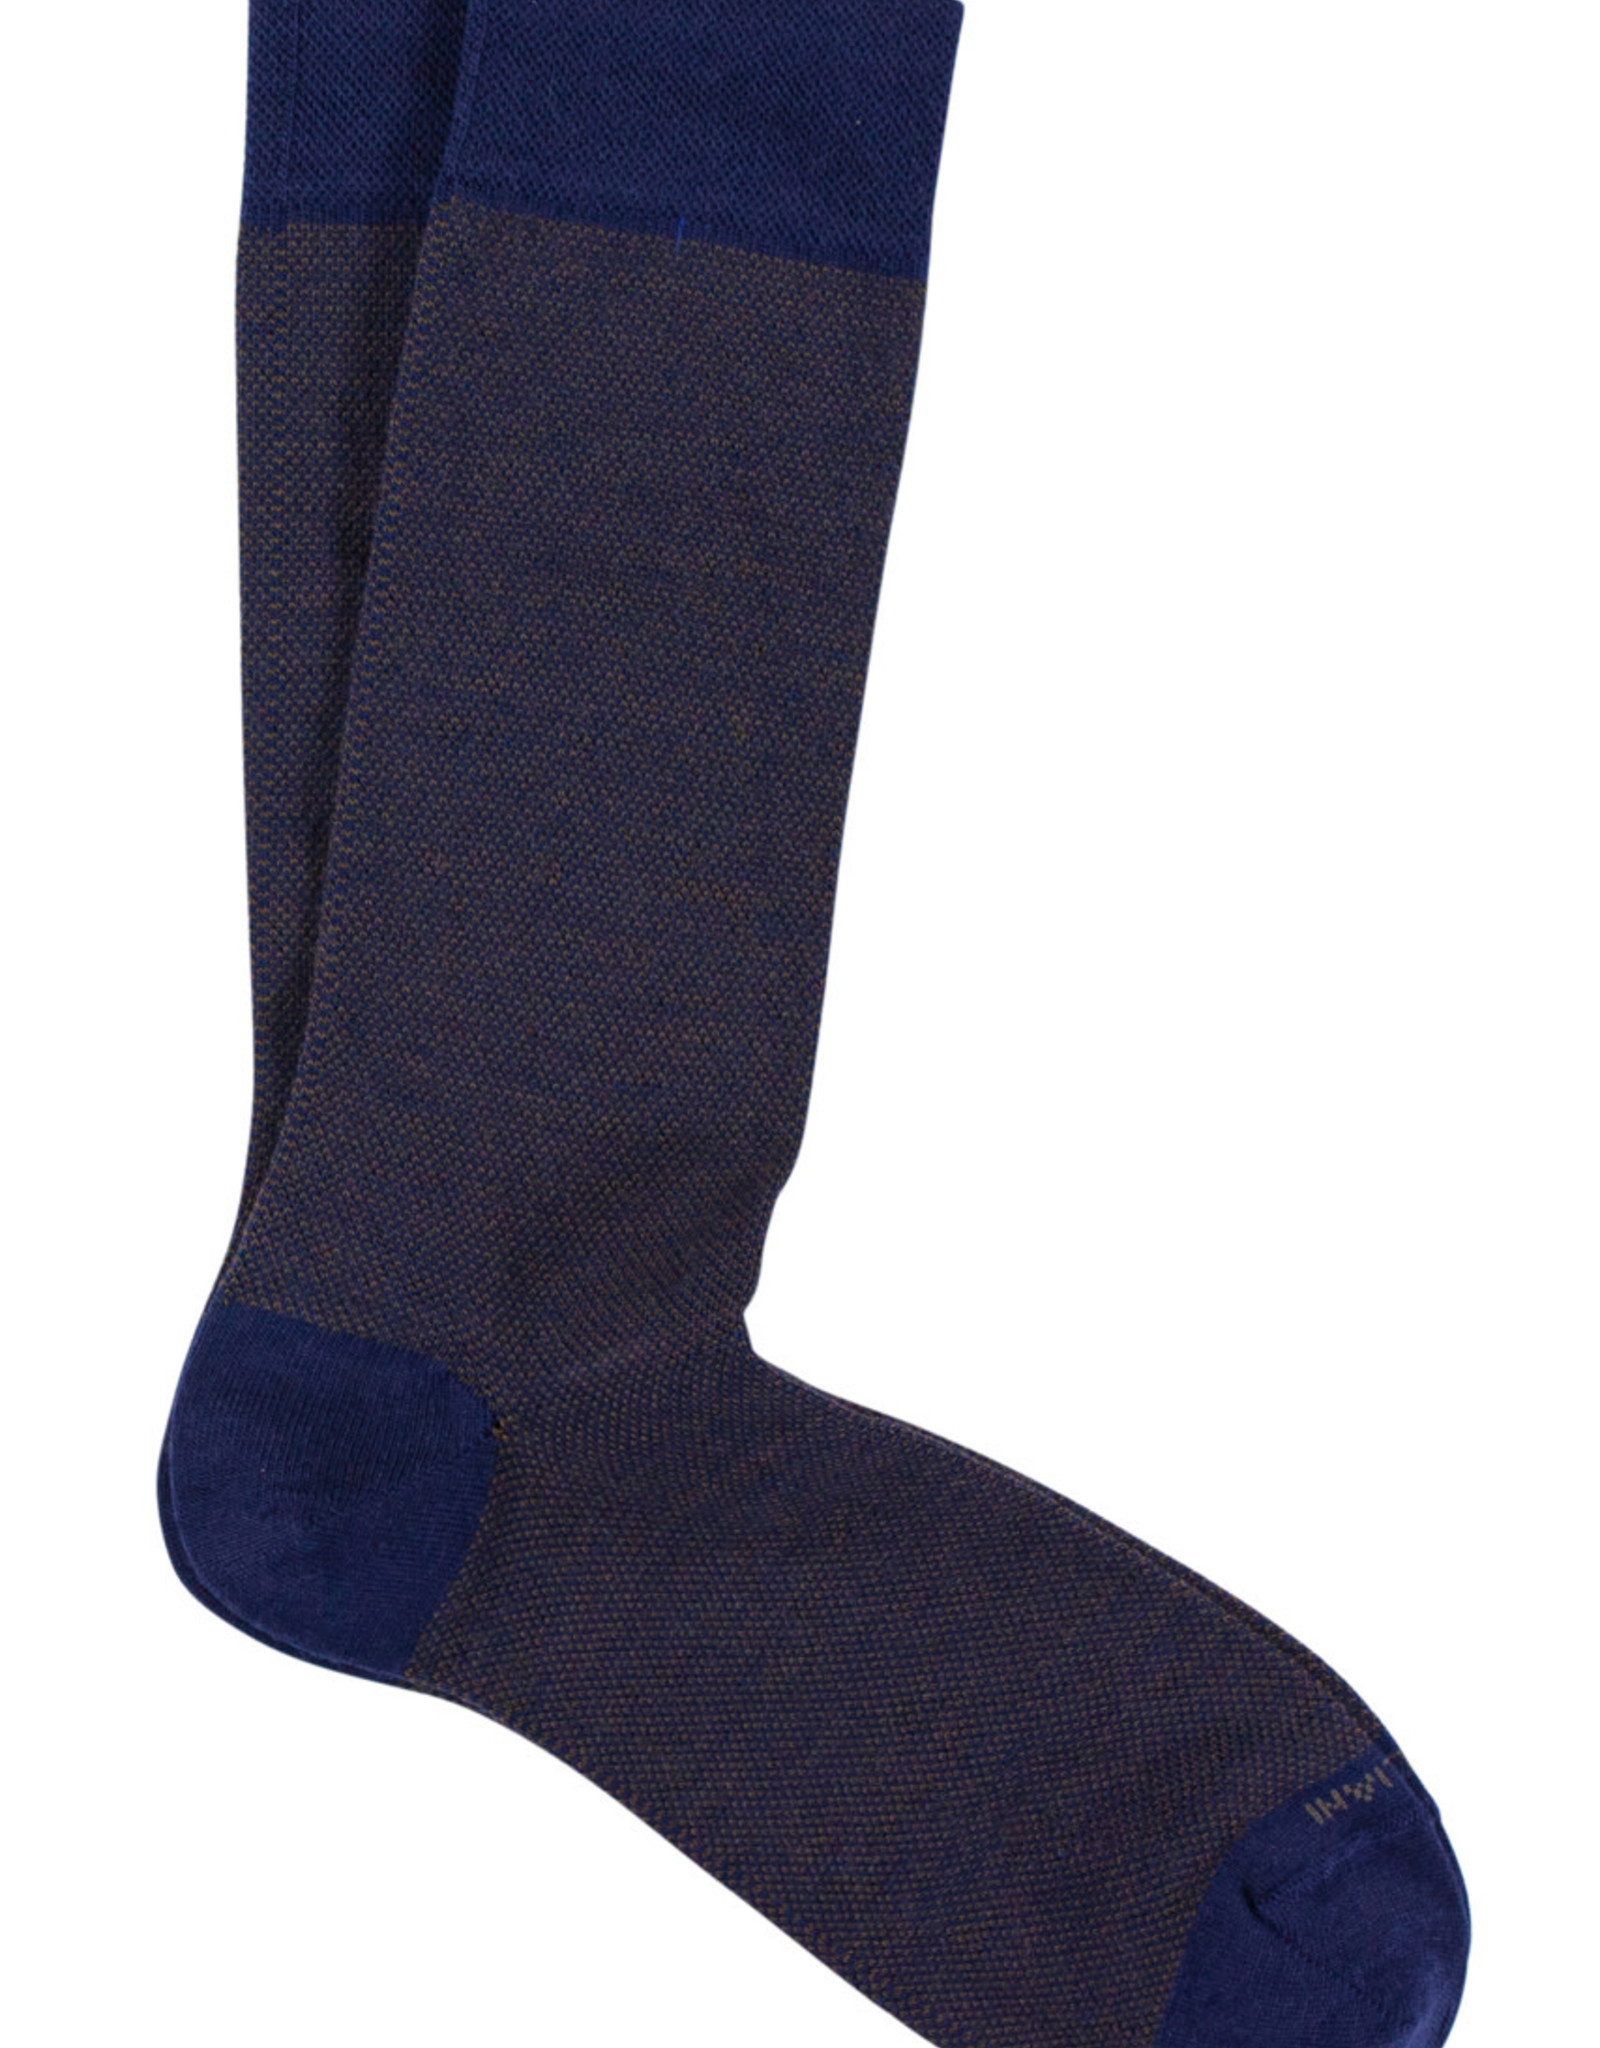 Marcoliani Marcoliani sokken blauw-bruin wol 4060T